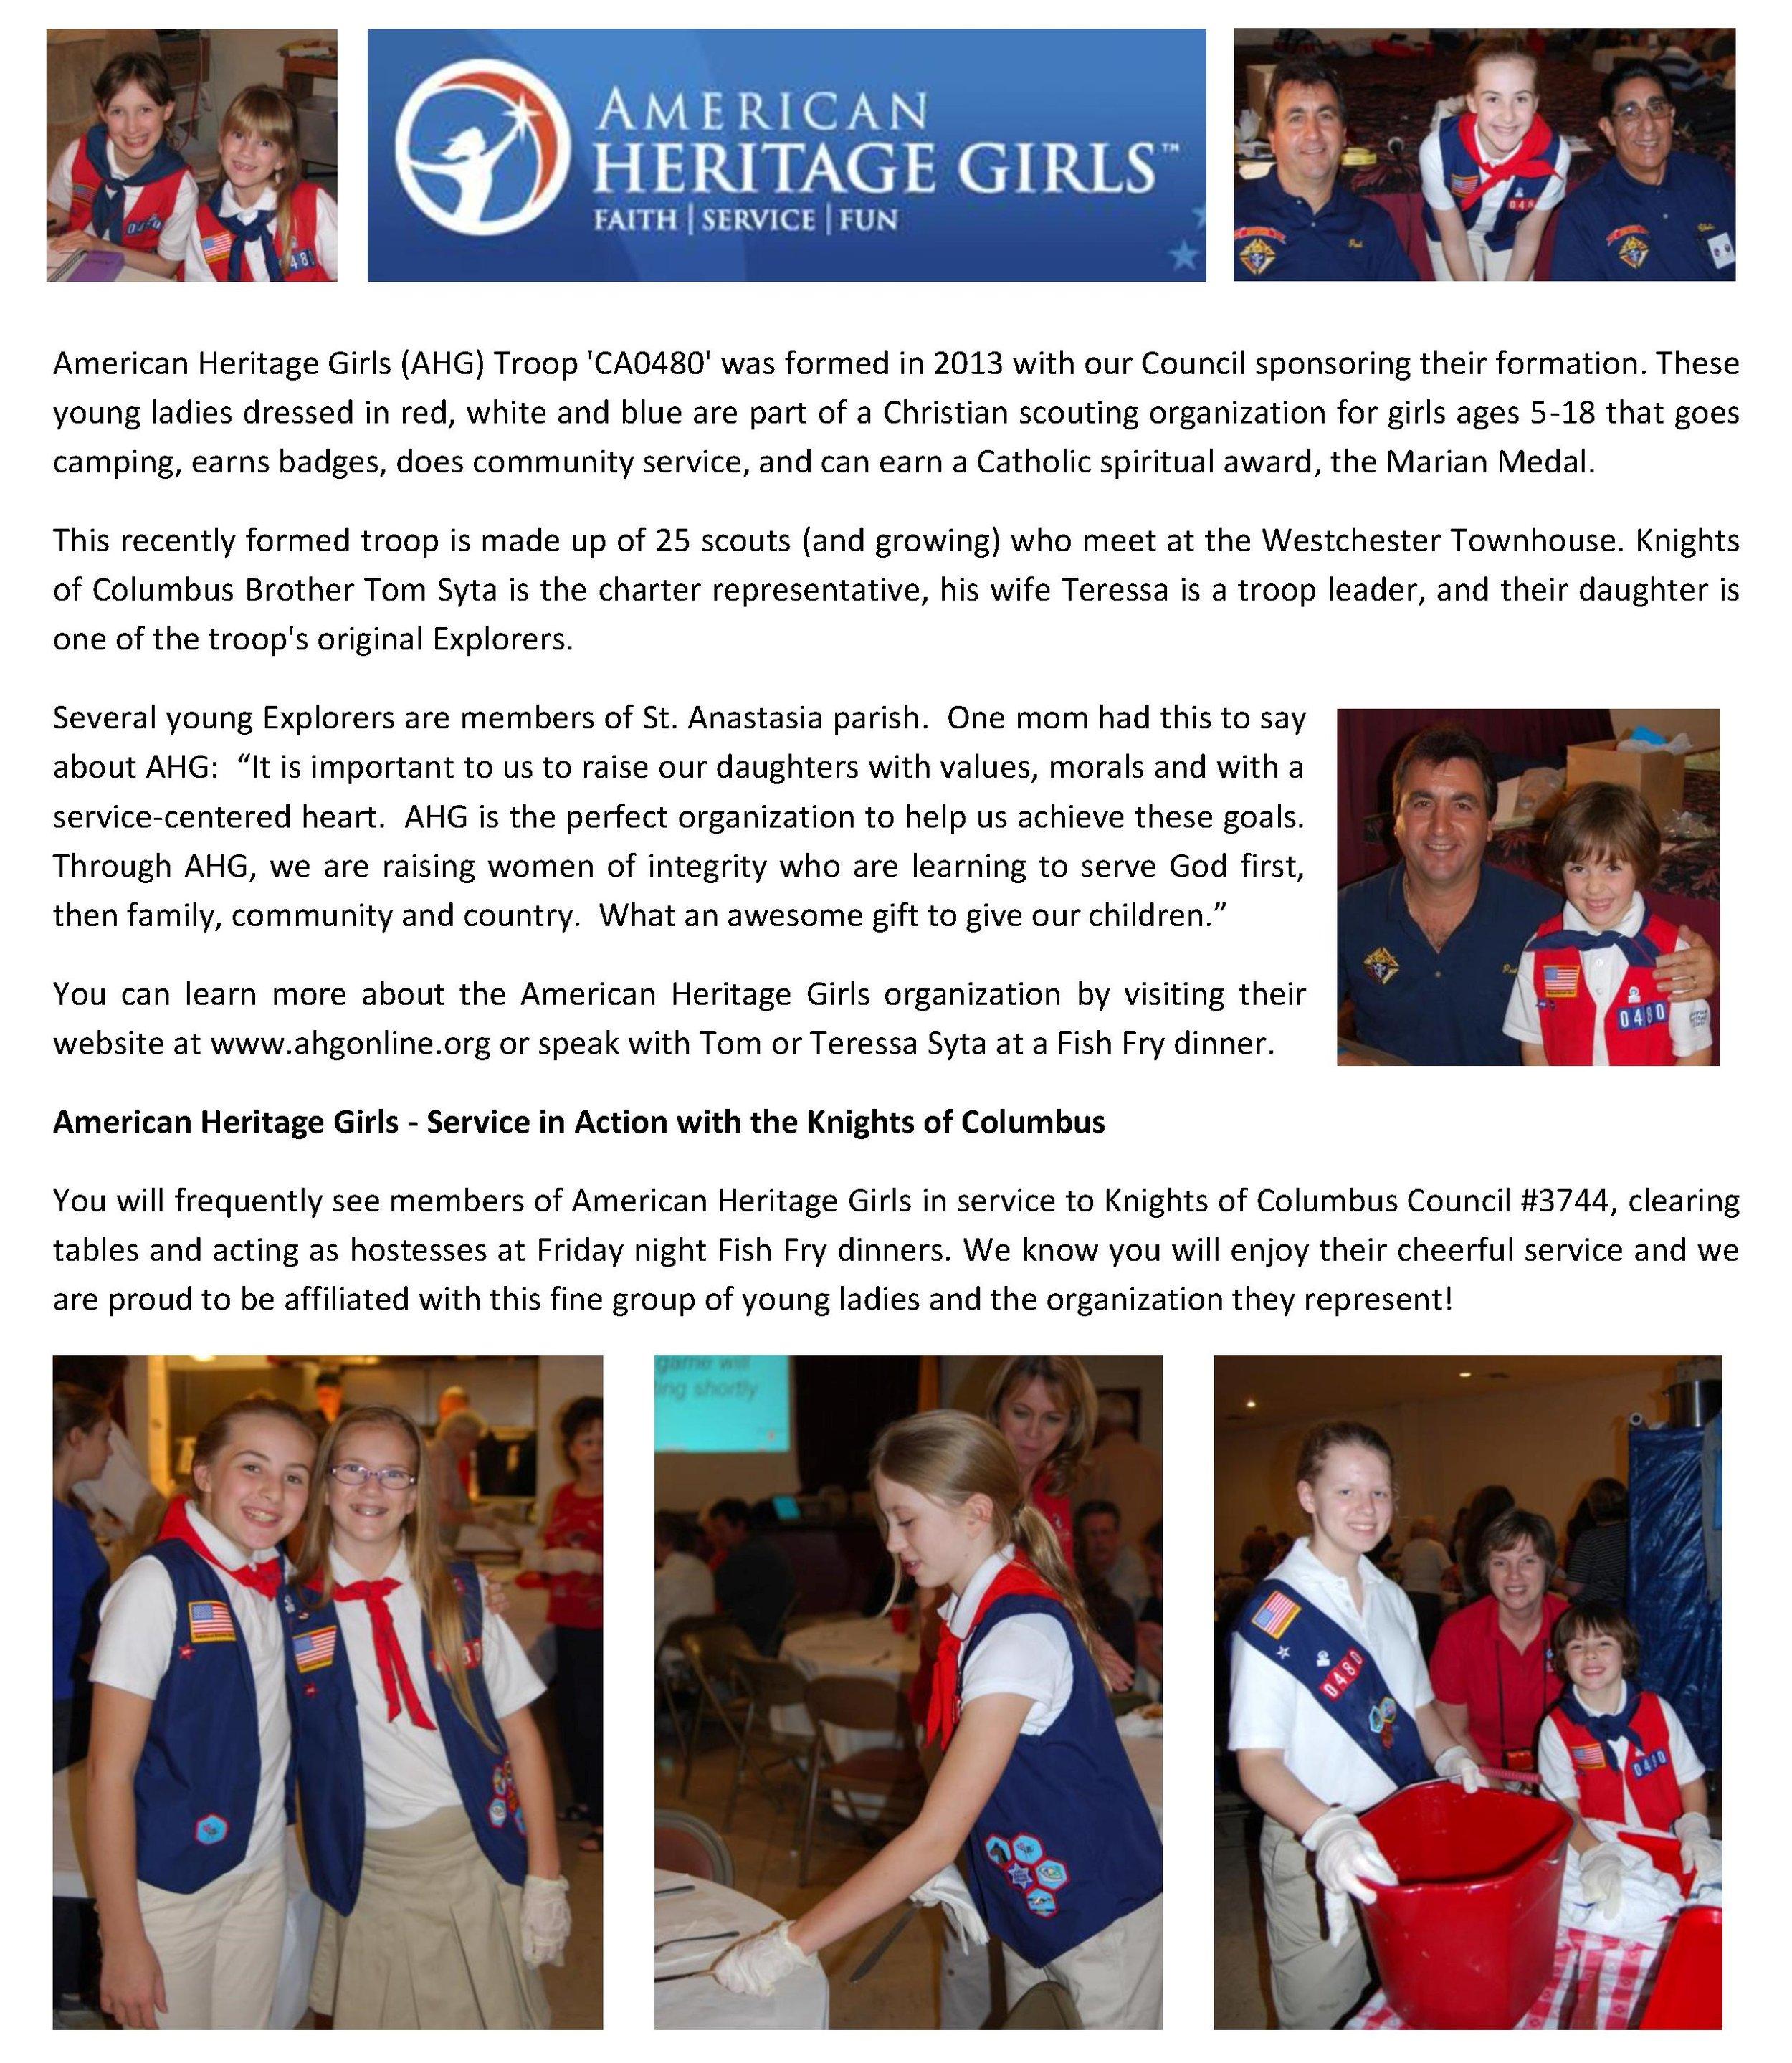 American Heritage Girls v2.jpg